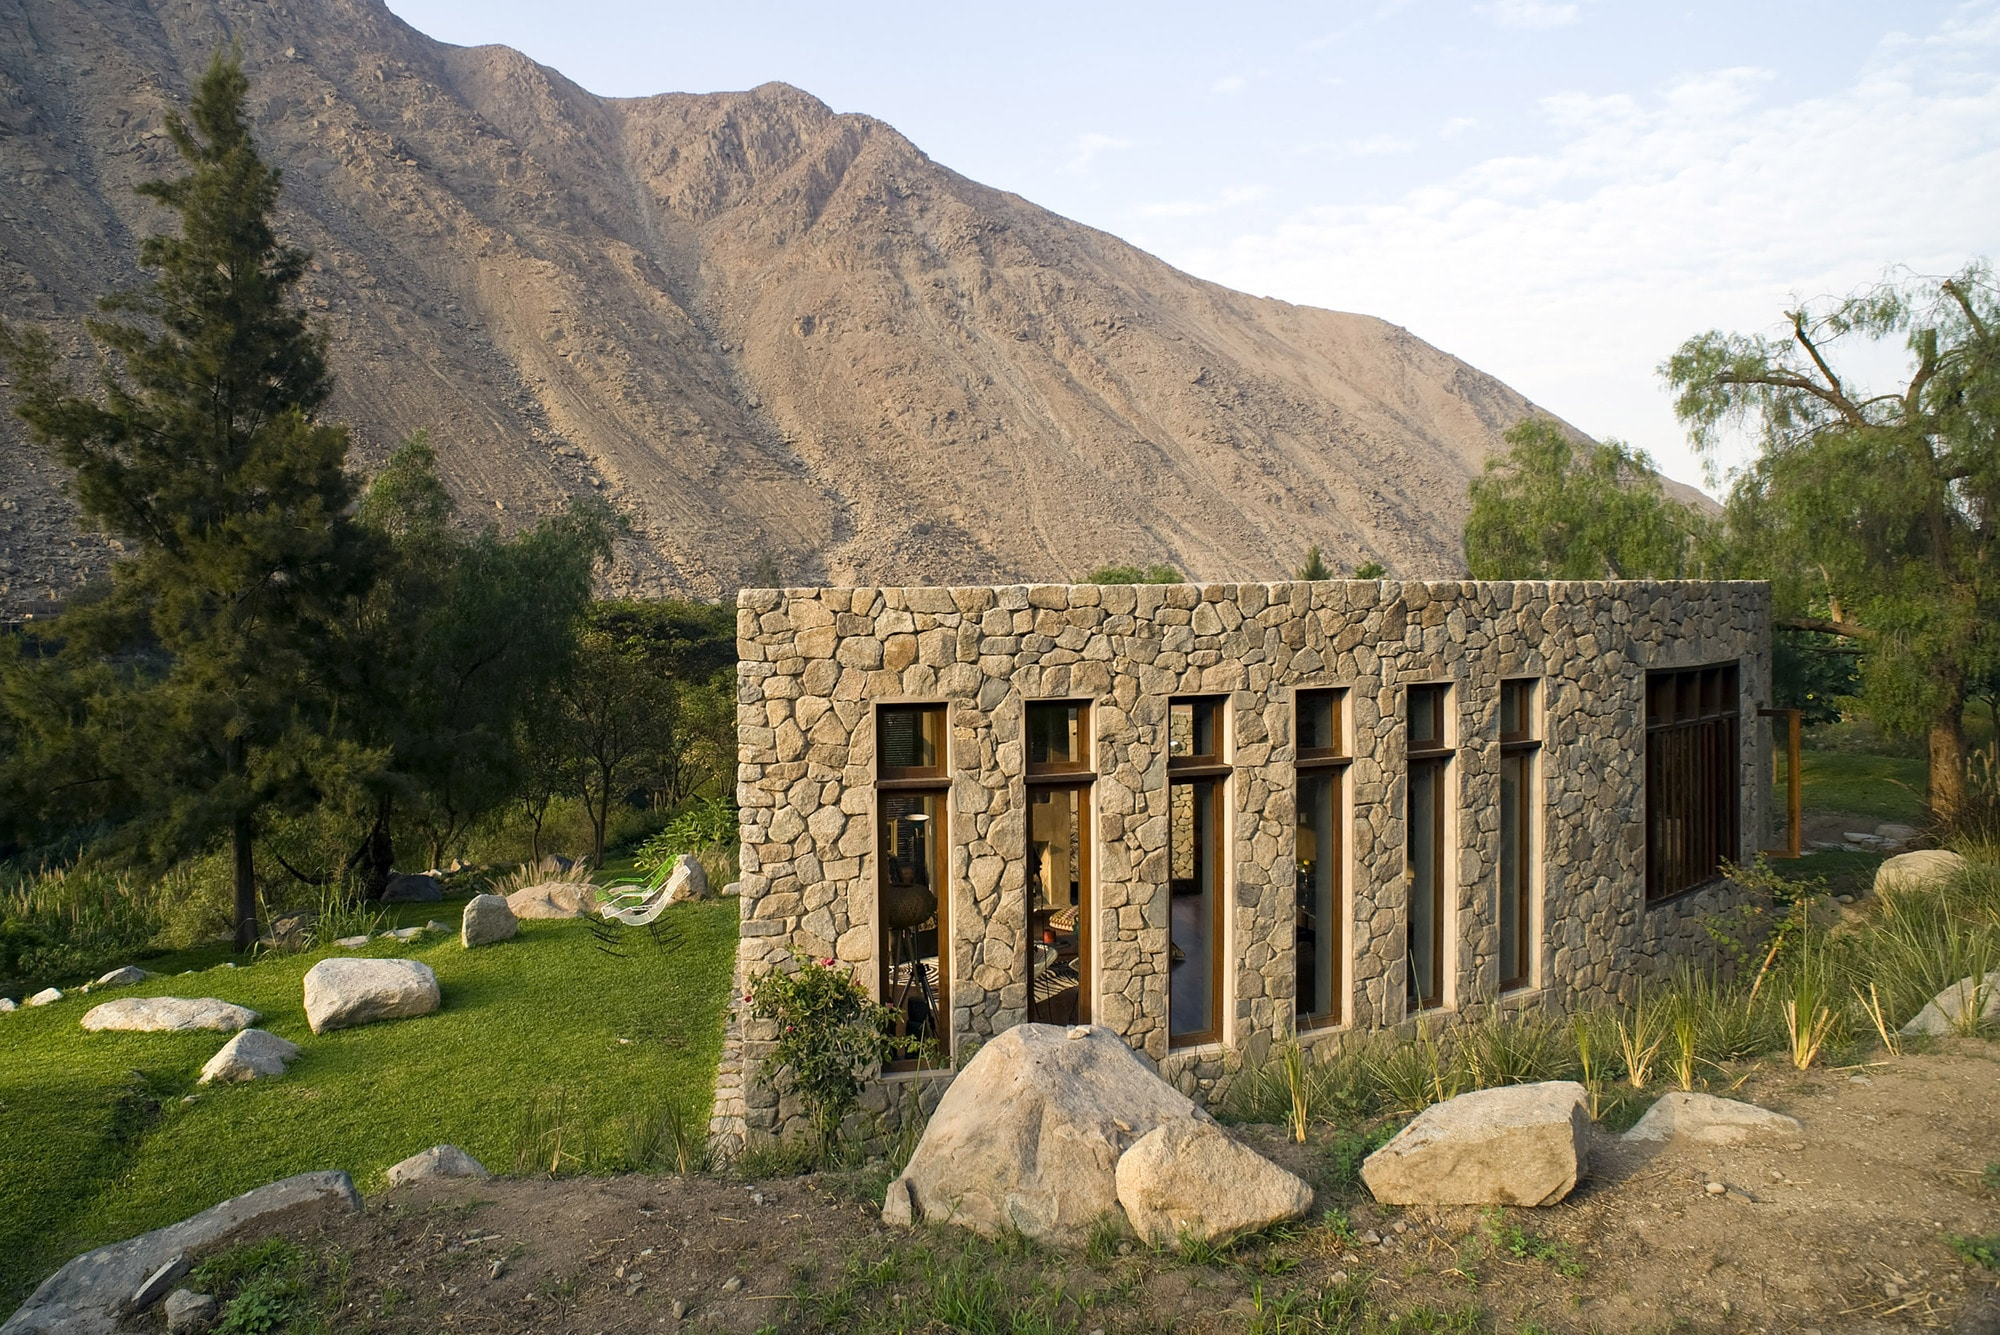 Dise o casa de campo tradicional for Casas con piedras en la fachada